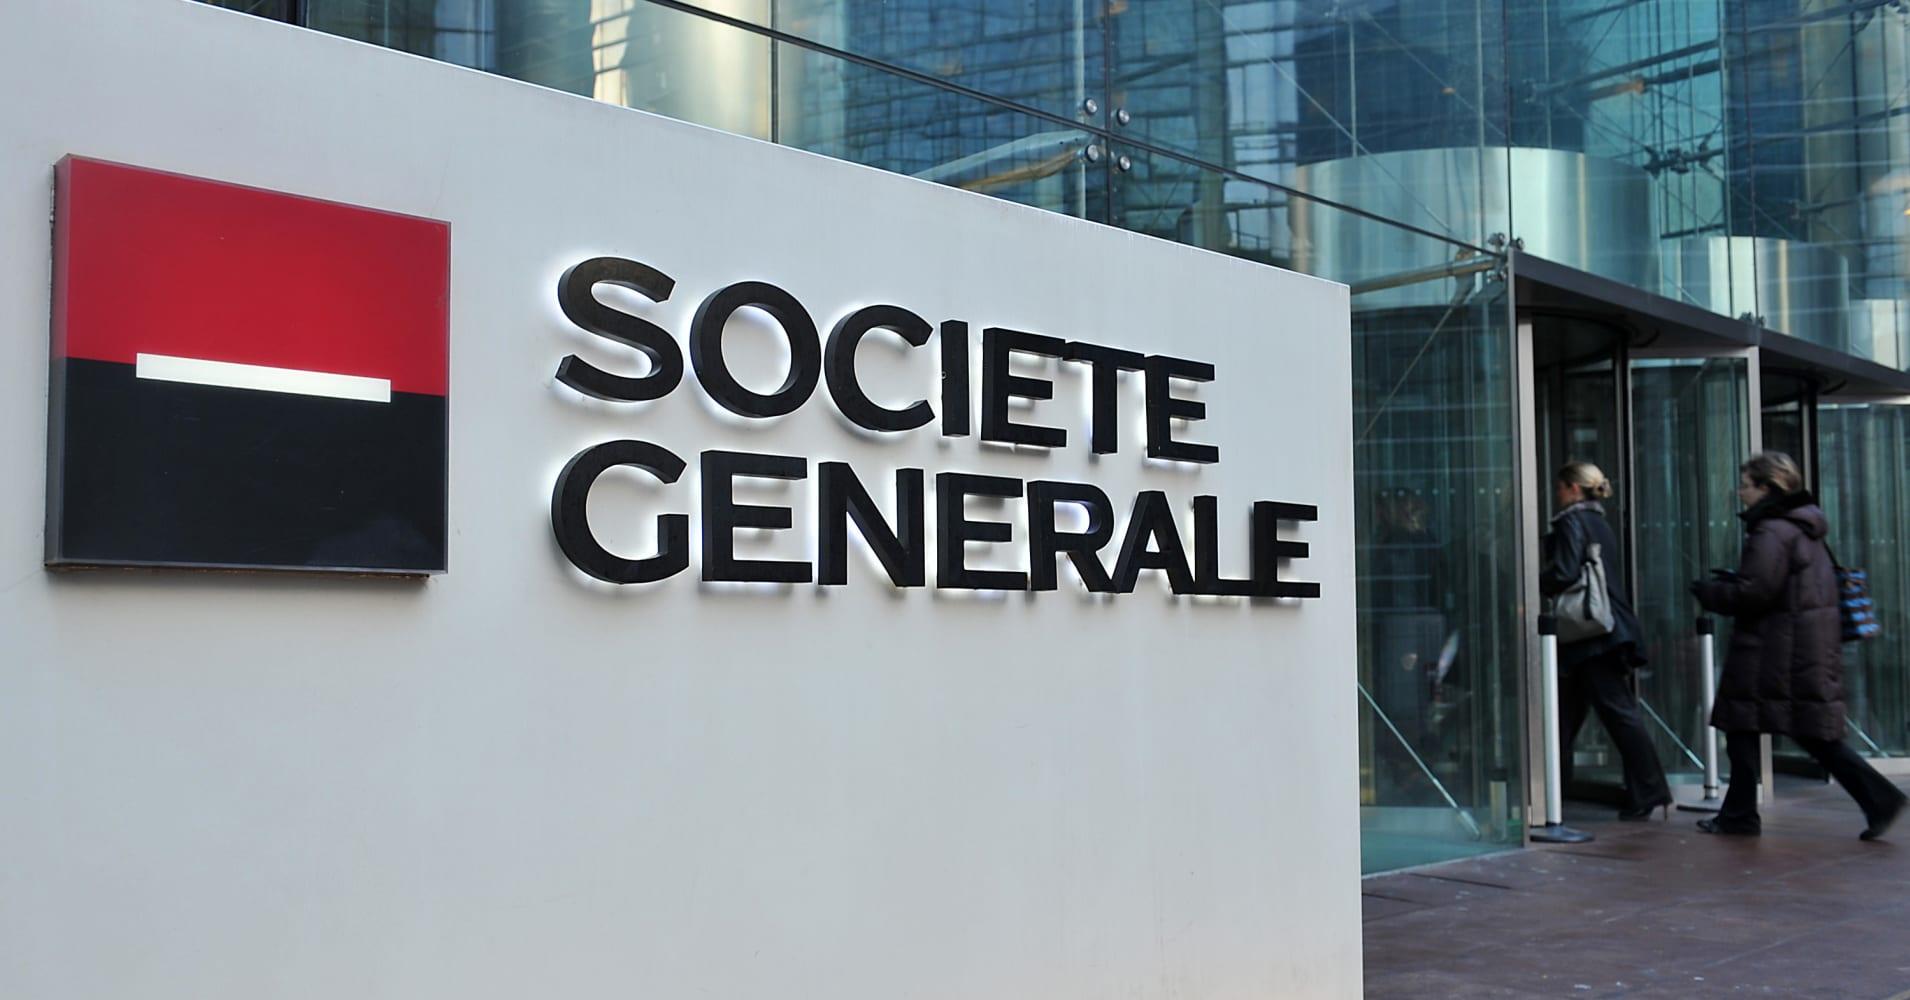 Societe Generale profits beat estimates as rebound in global markets drives growth